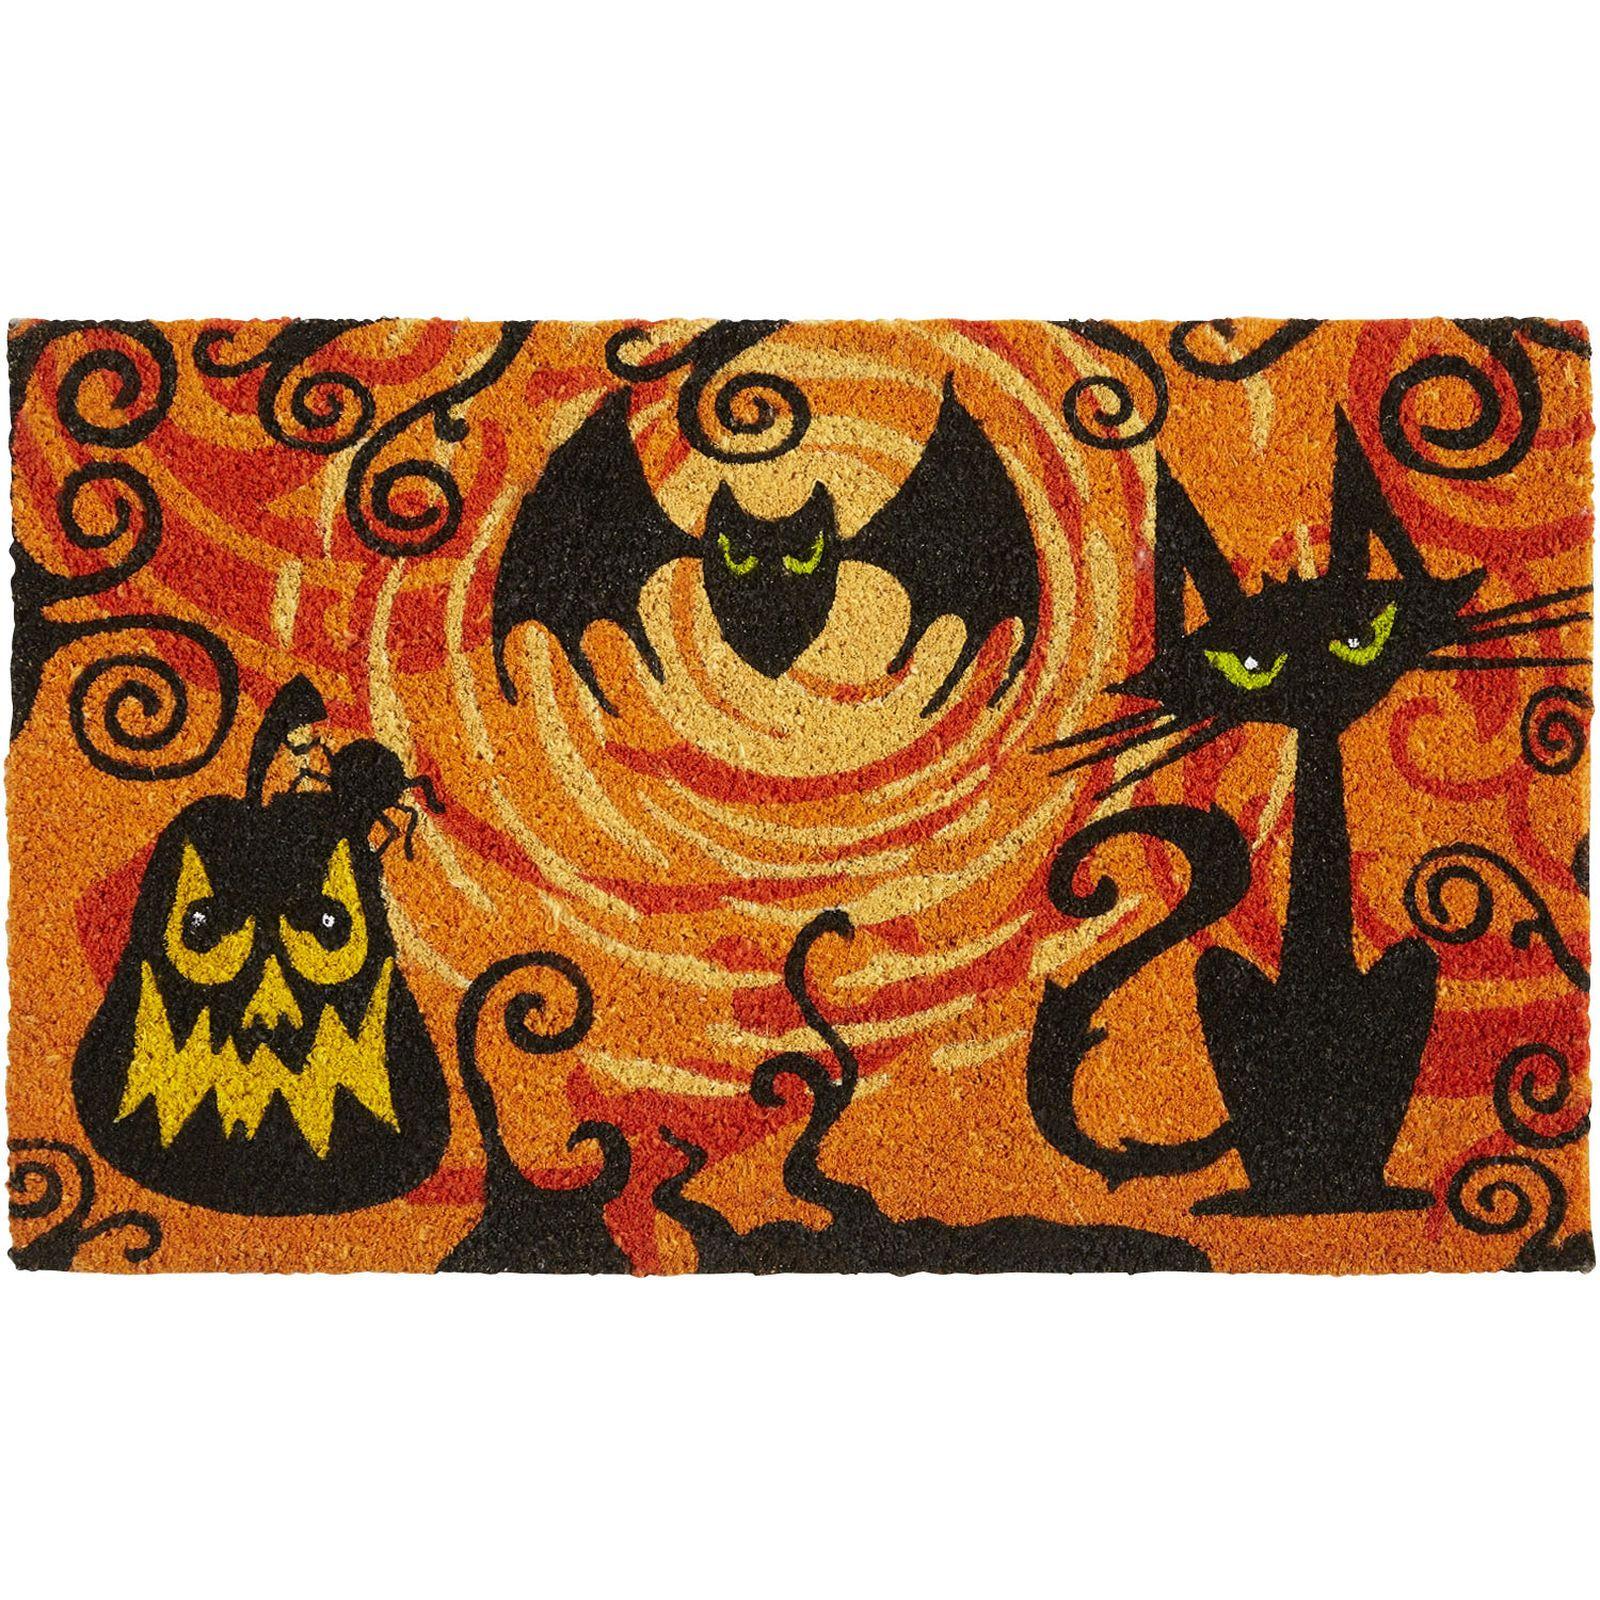 scary kitty bat doormat pier 1 imports - Pier One Halloween